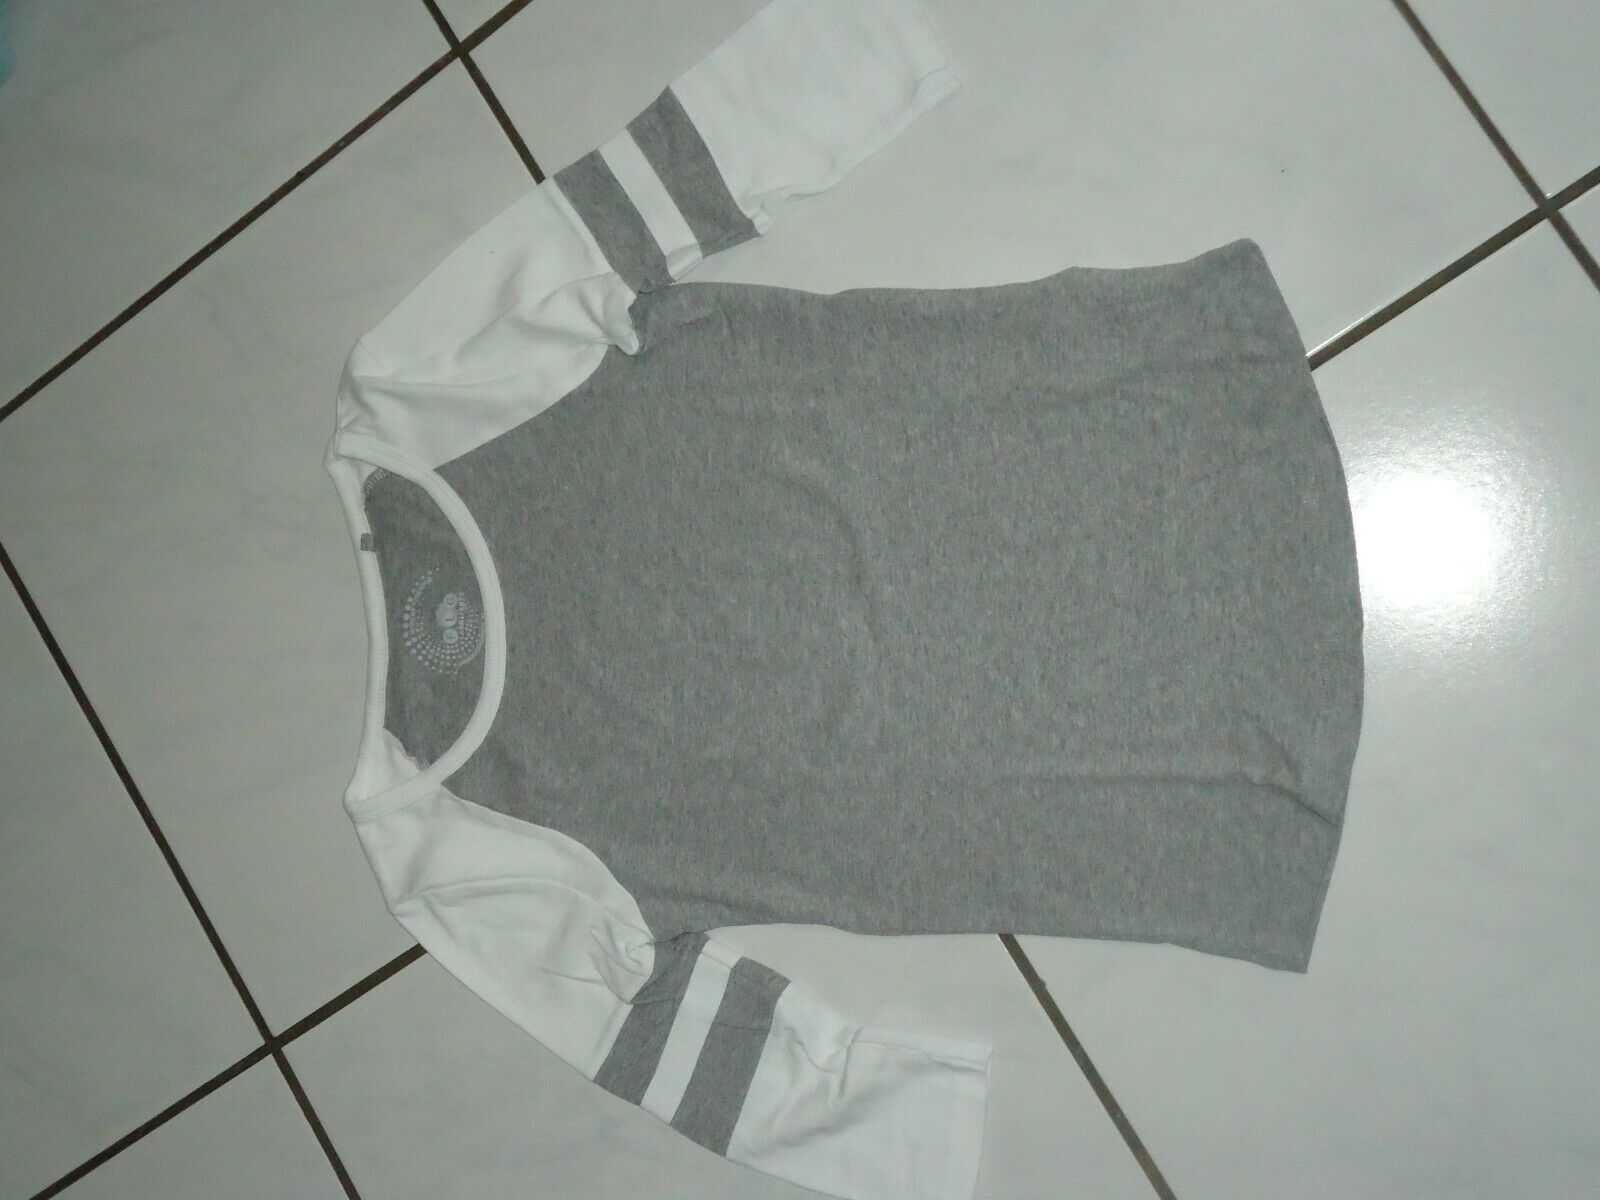 Damen langarm Shirt grau weiß Gr. XS